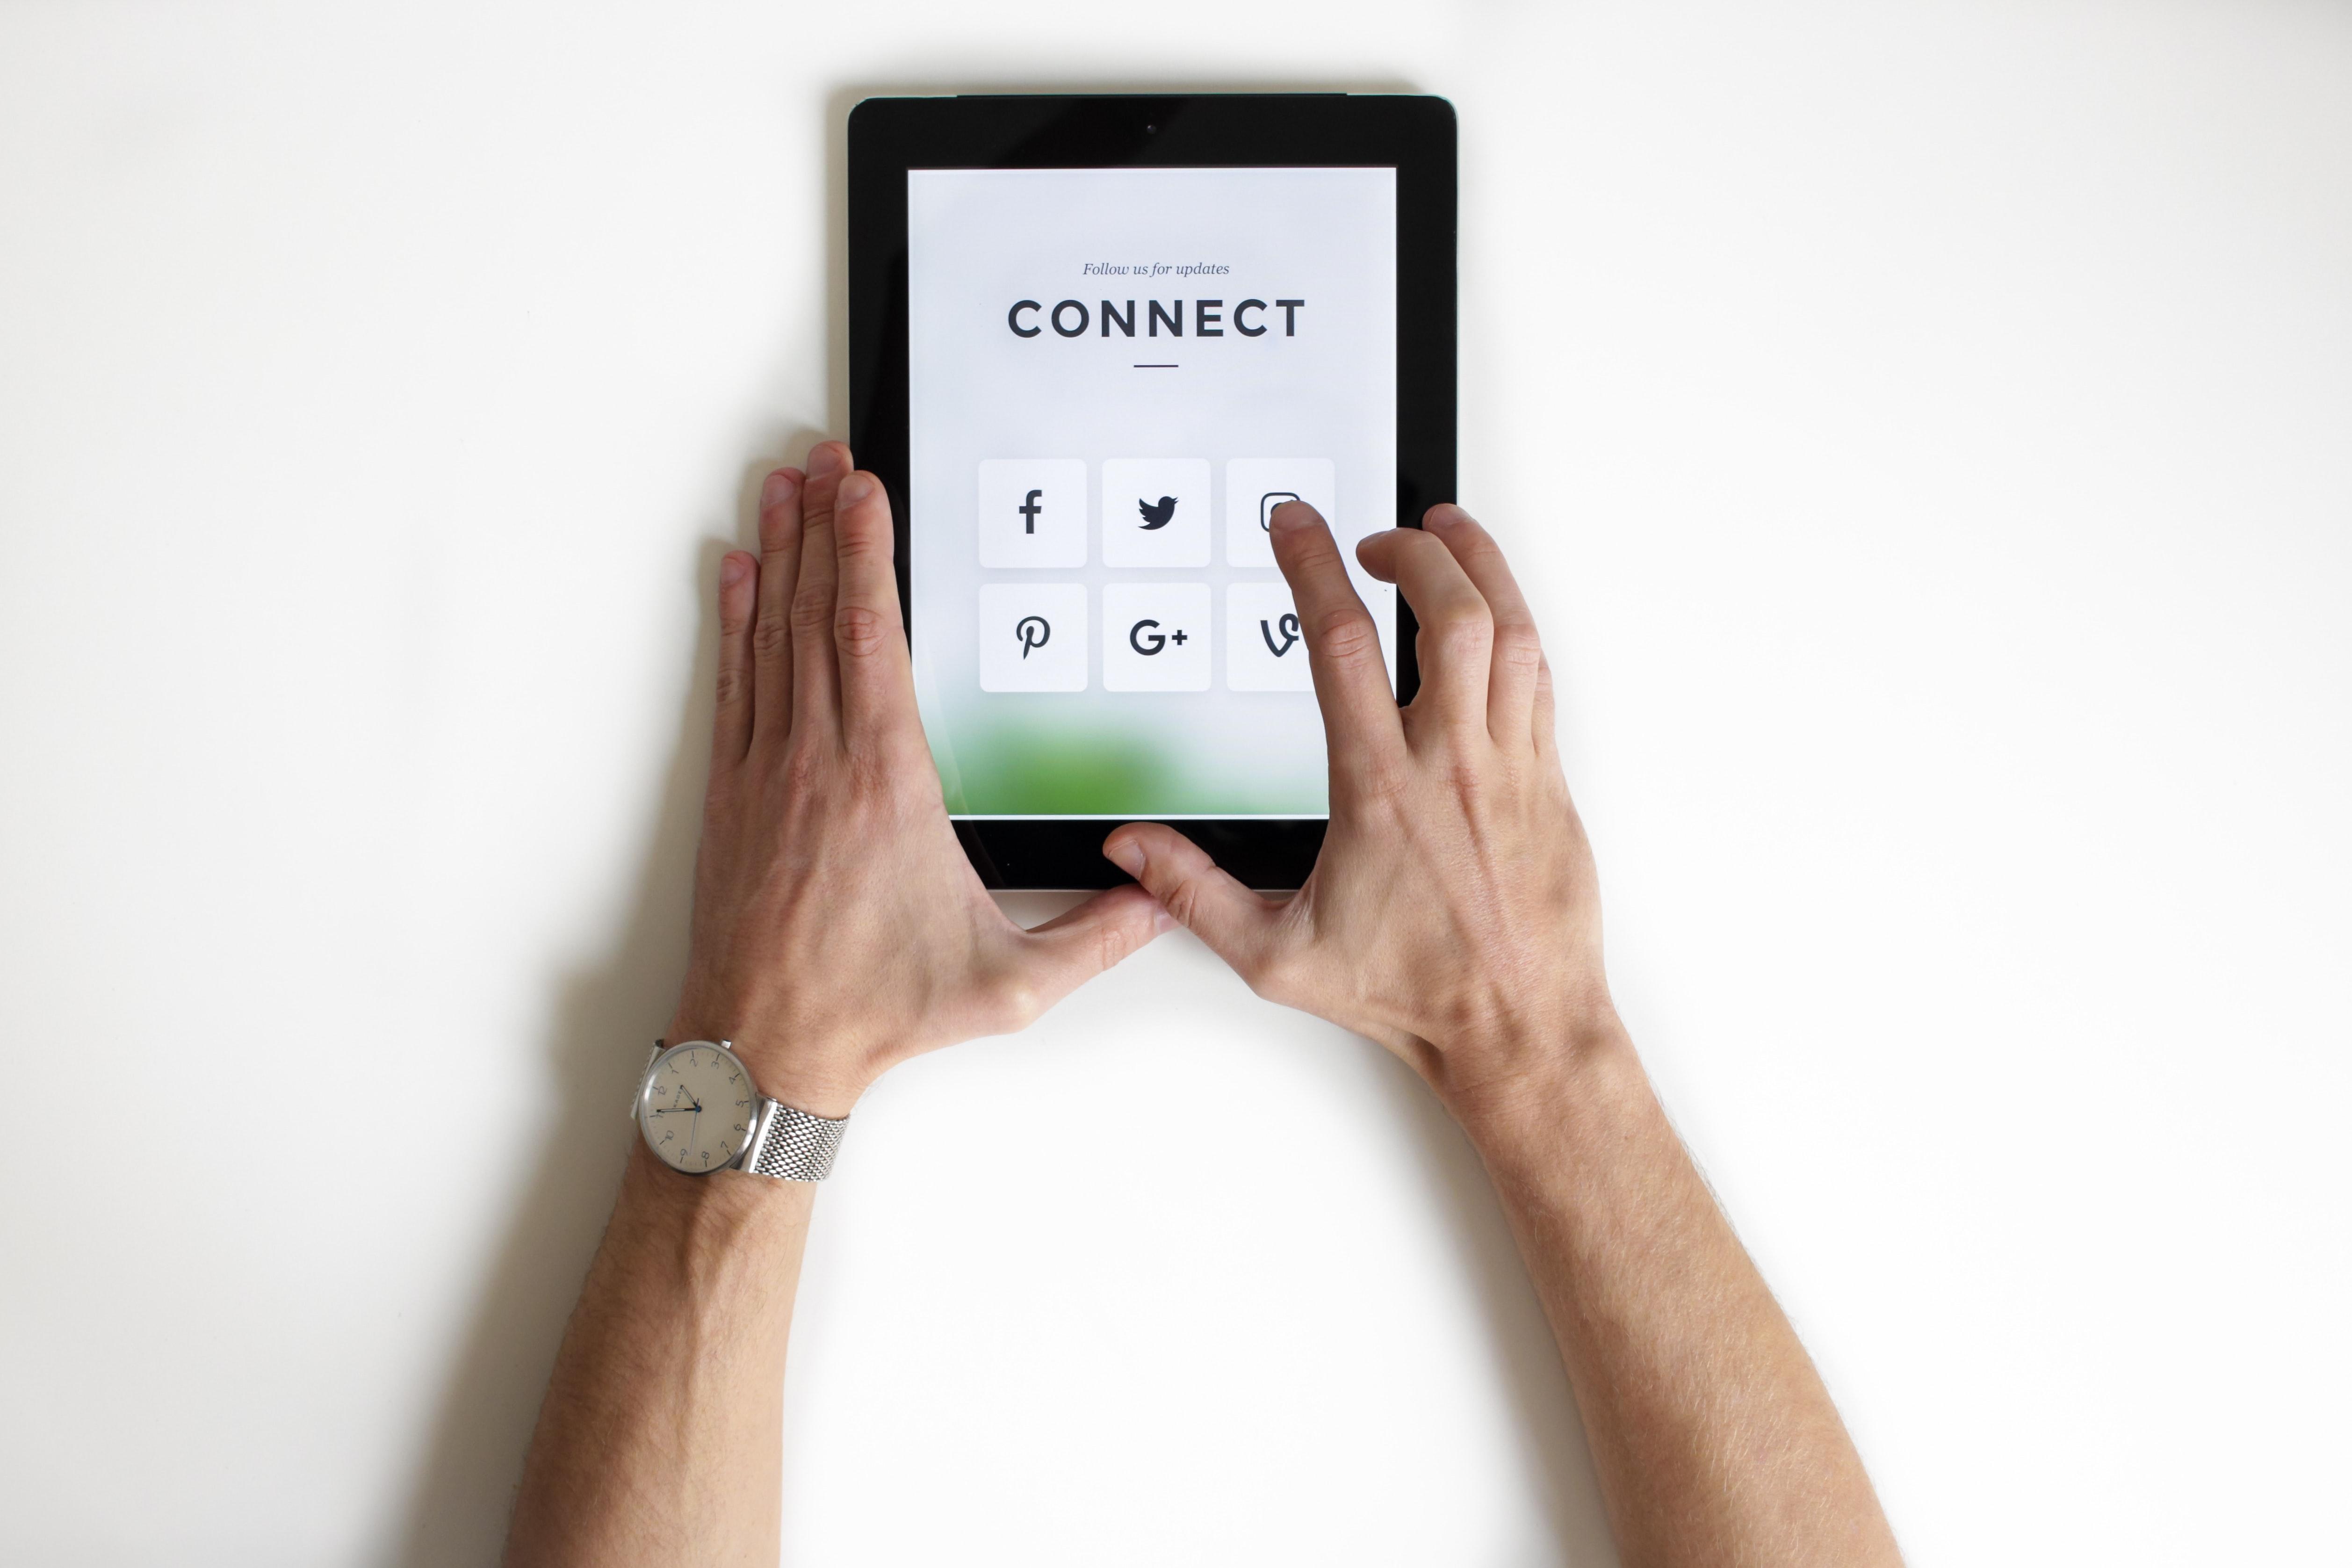 OC Interactive Digital Agency IvSsZ1HmtwGuQfJqv9ux Social Media Marketing for Restaurants: Things You're Missing Out Social Media    Image of IvSsZ1HmtwGuQfJqv9ux